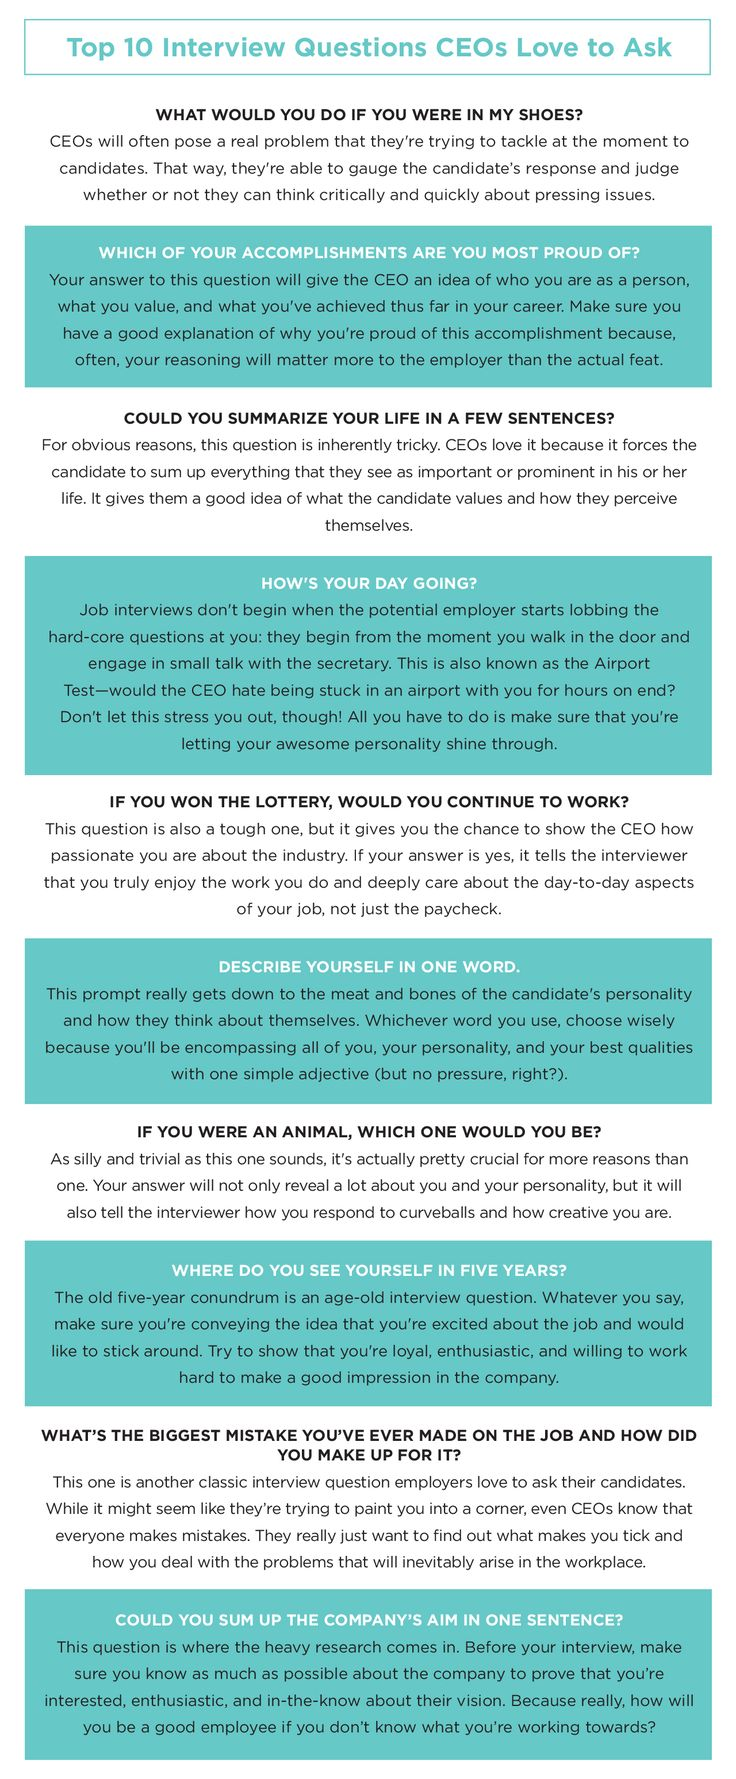 Best 25+ Top interview questions ideas on Pinterest